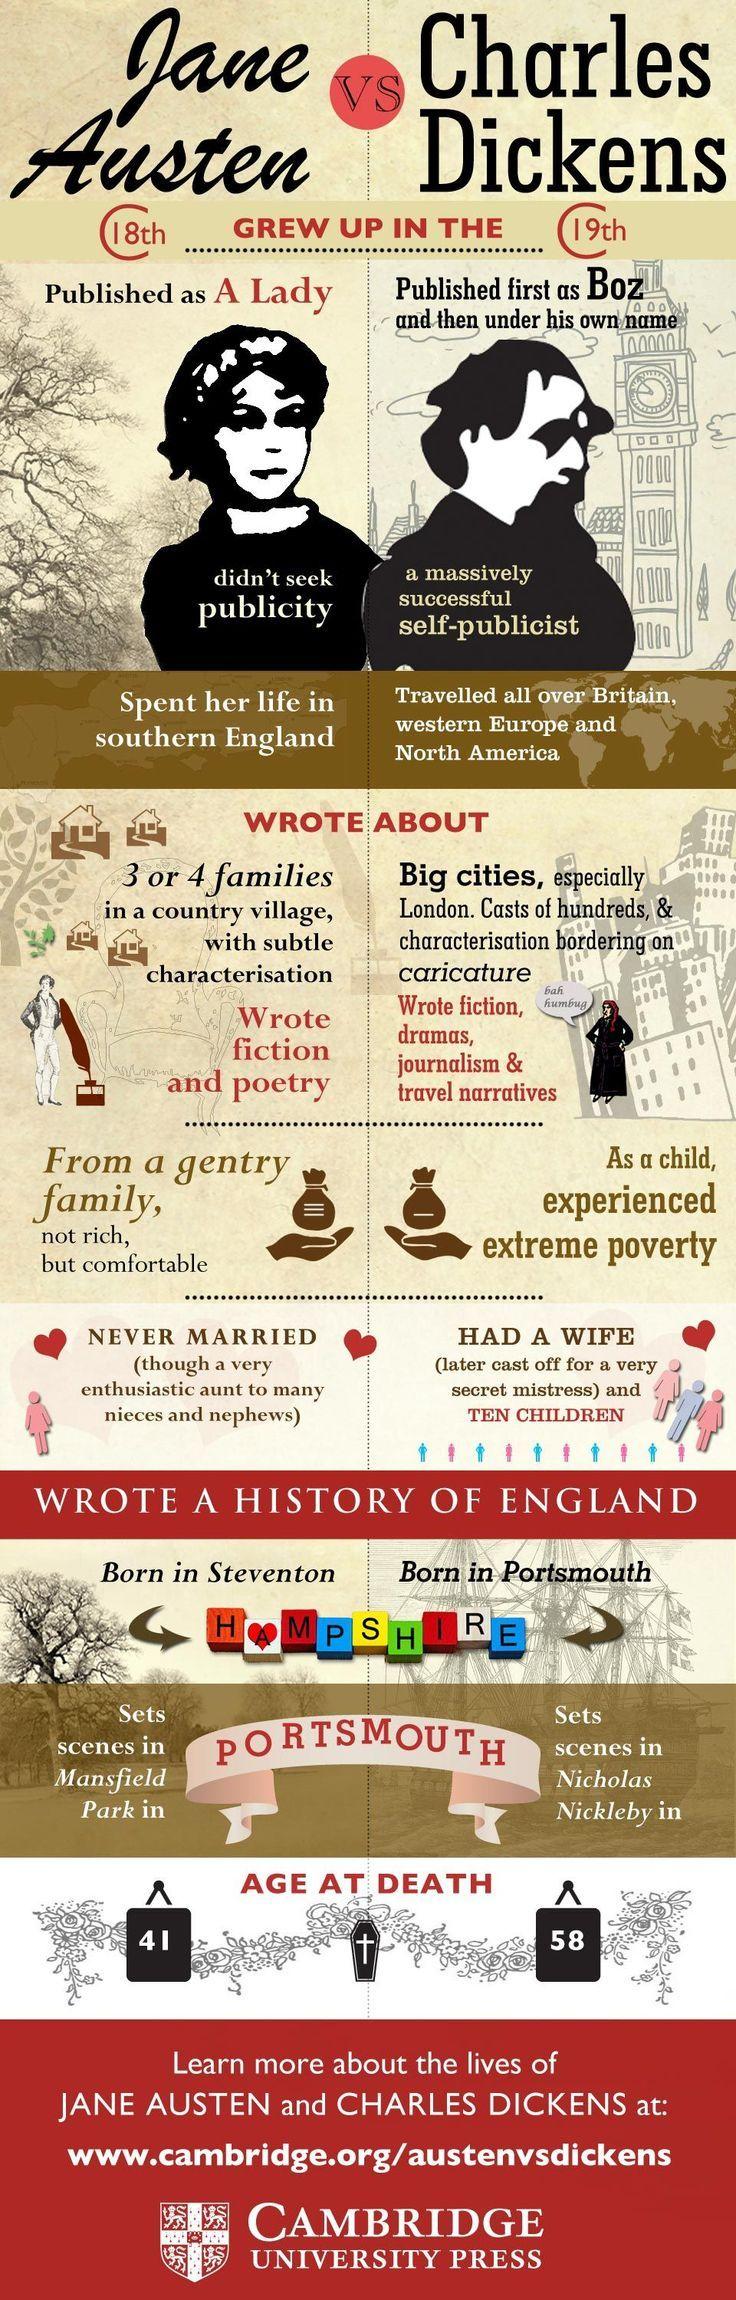 Team Austen or Team Dickens?!